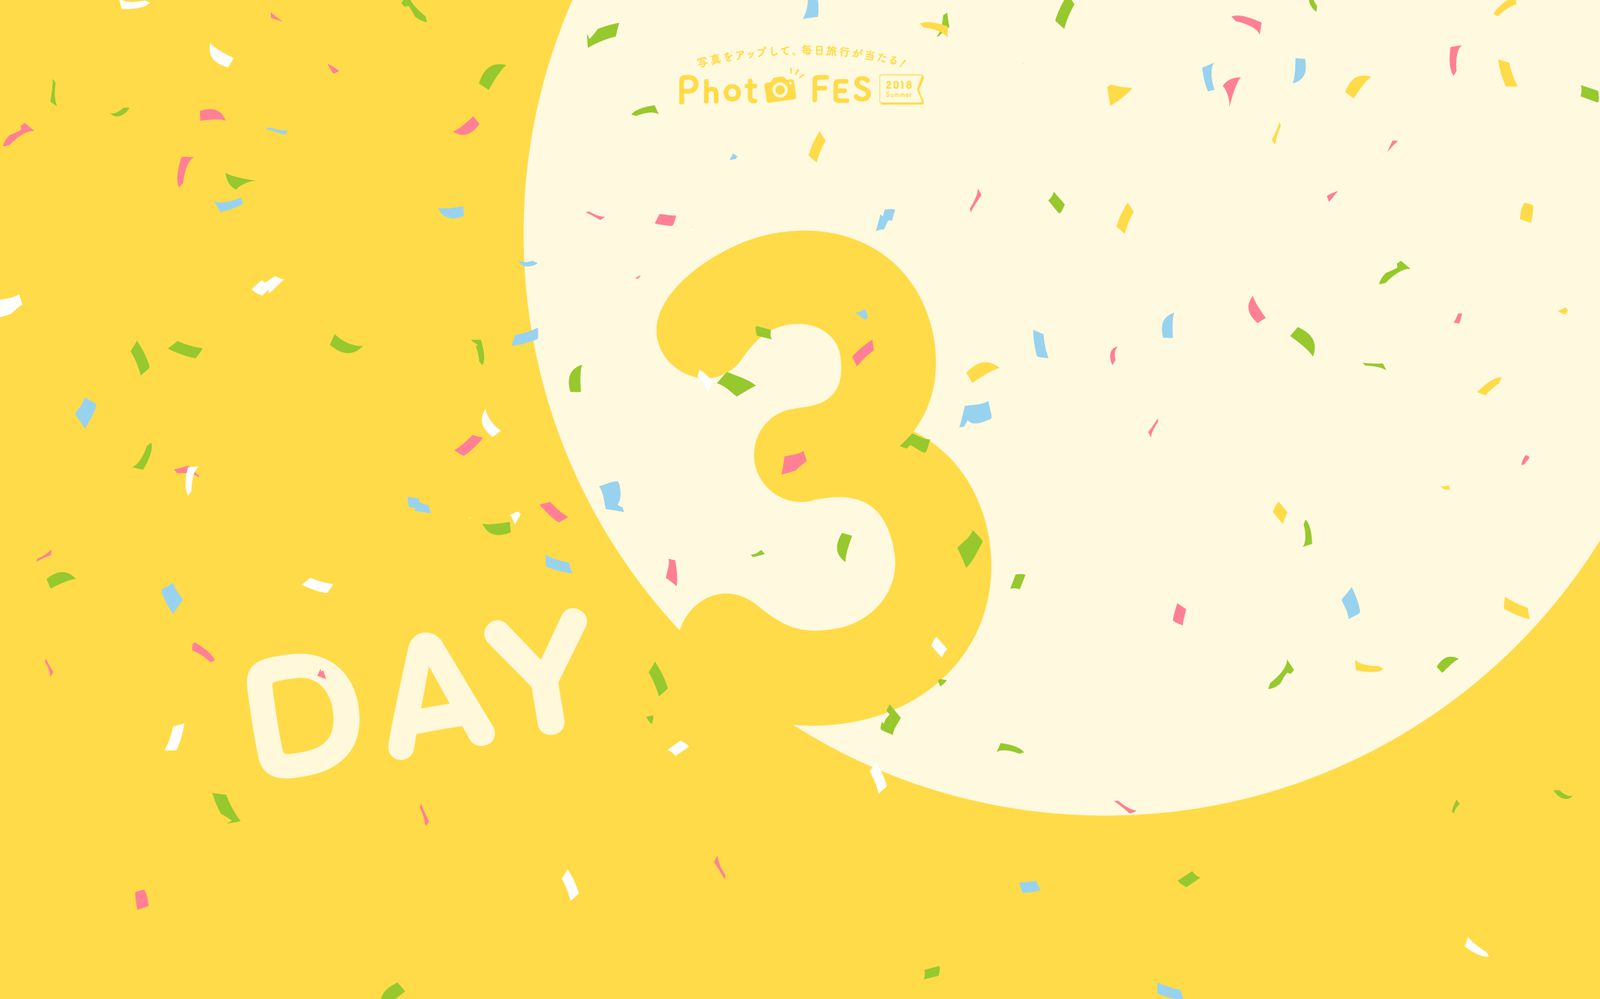 【DAY3】「Photo FES 2018」6月28日投稿分であたる賞品&受賞者発表